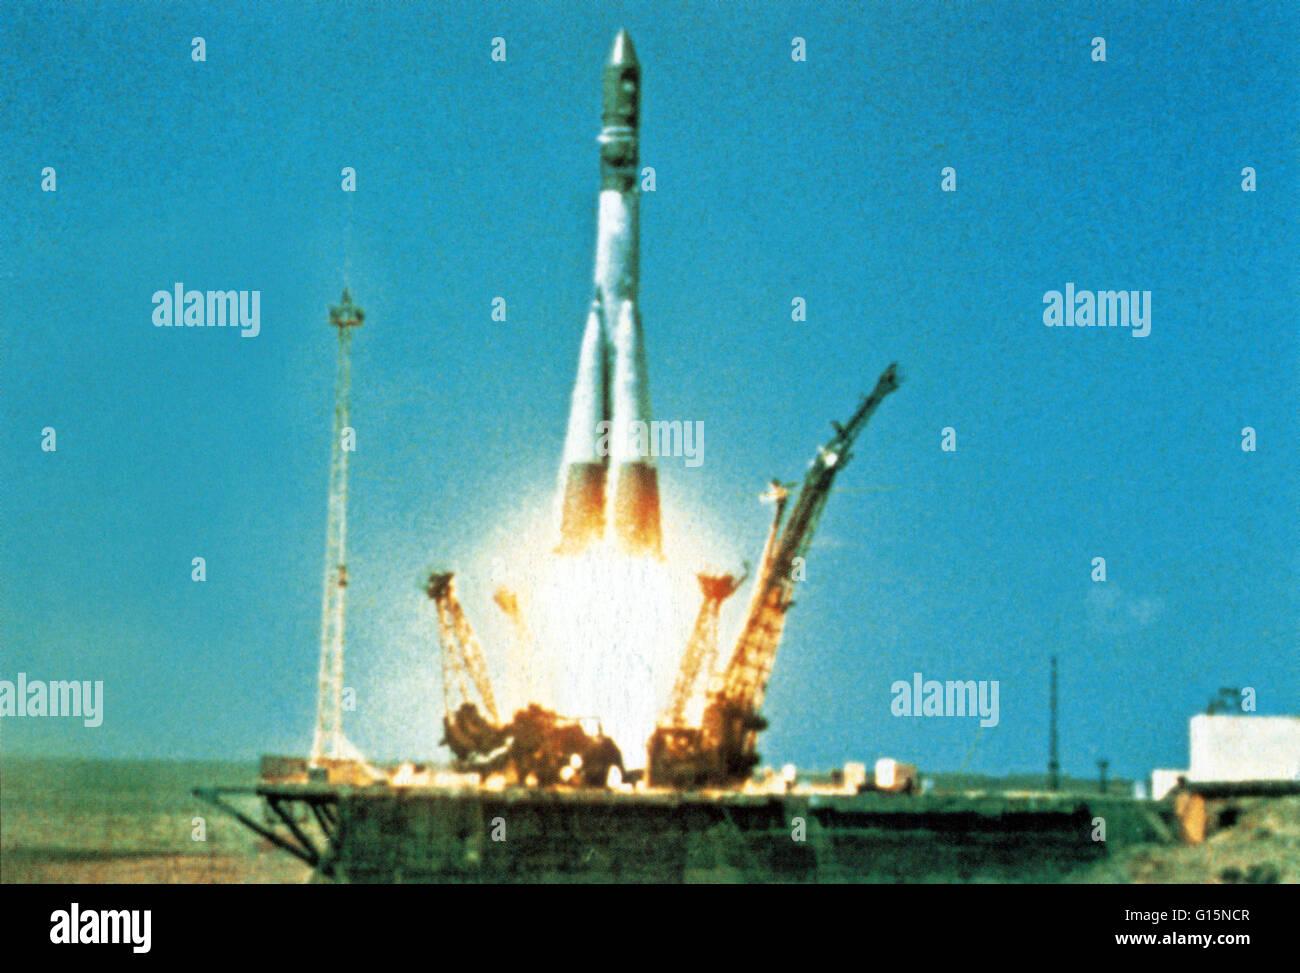 The Vostok booster leaves the Baikonur launch pad No. 1, carrying Soviet cosmonaut Yuri Gagarin towards Earth orbit - Stock Image